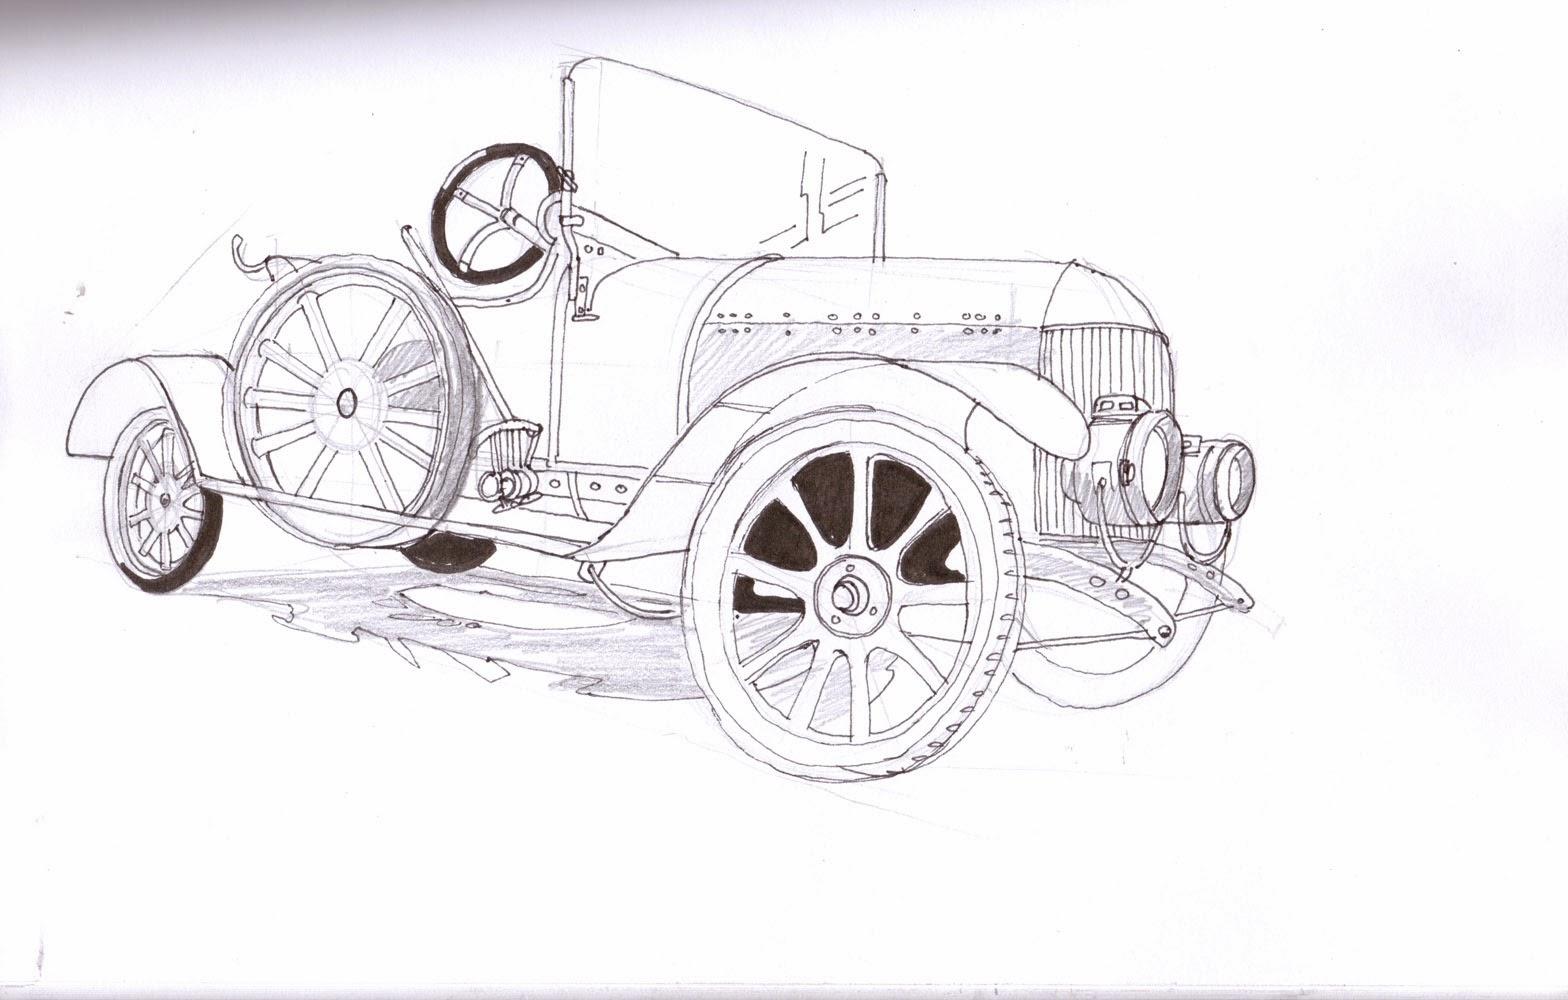 My Sketchblog: Car sketches-1913 Morris Oxford sketch and 1929 ...